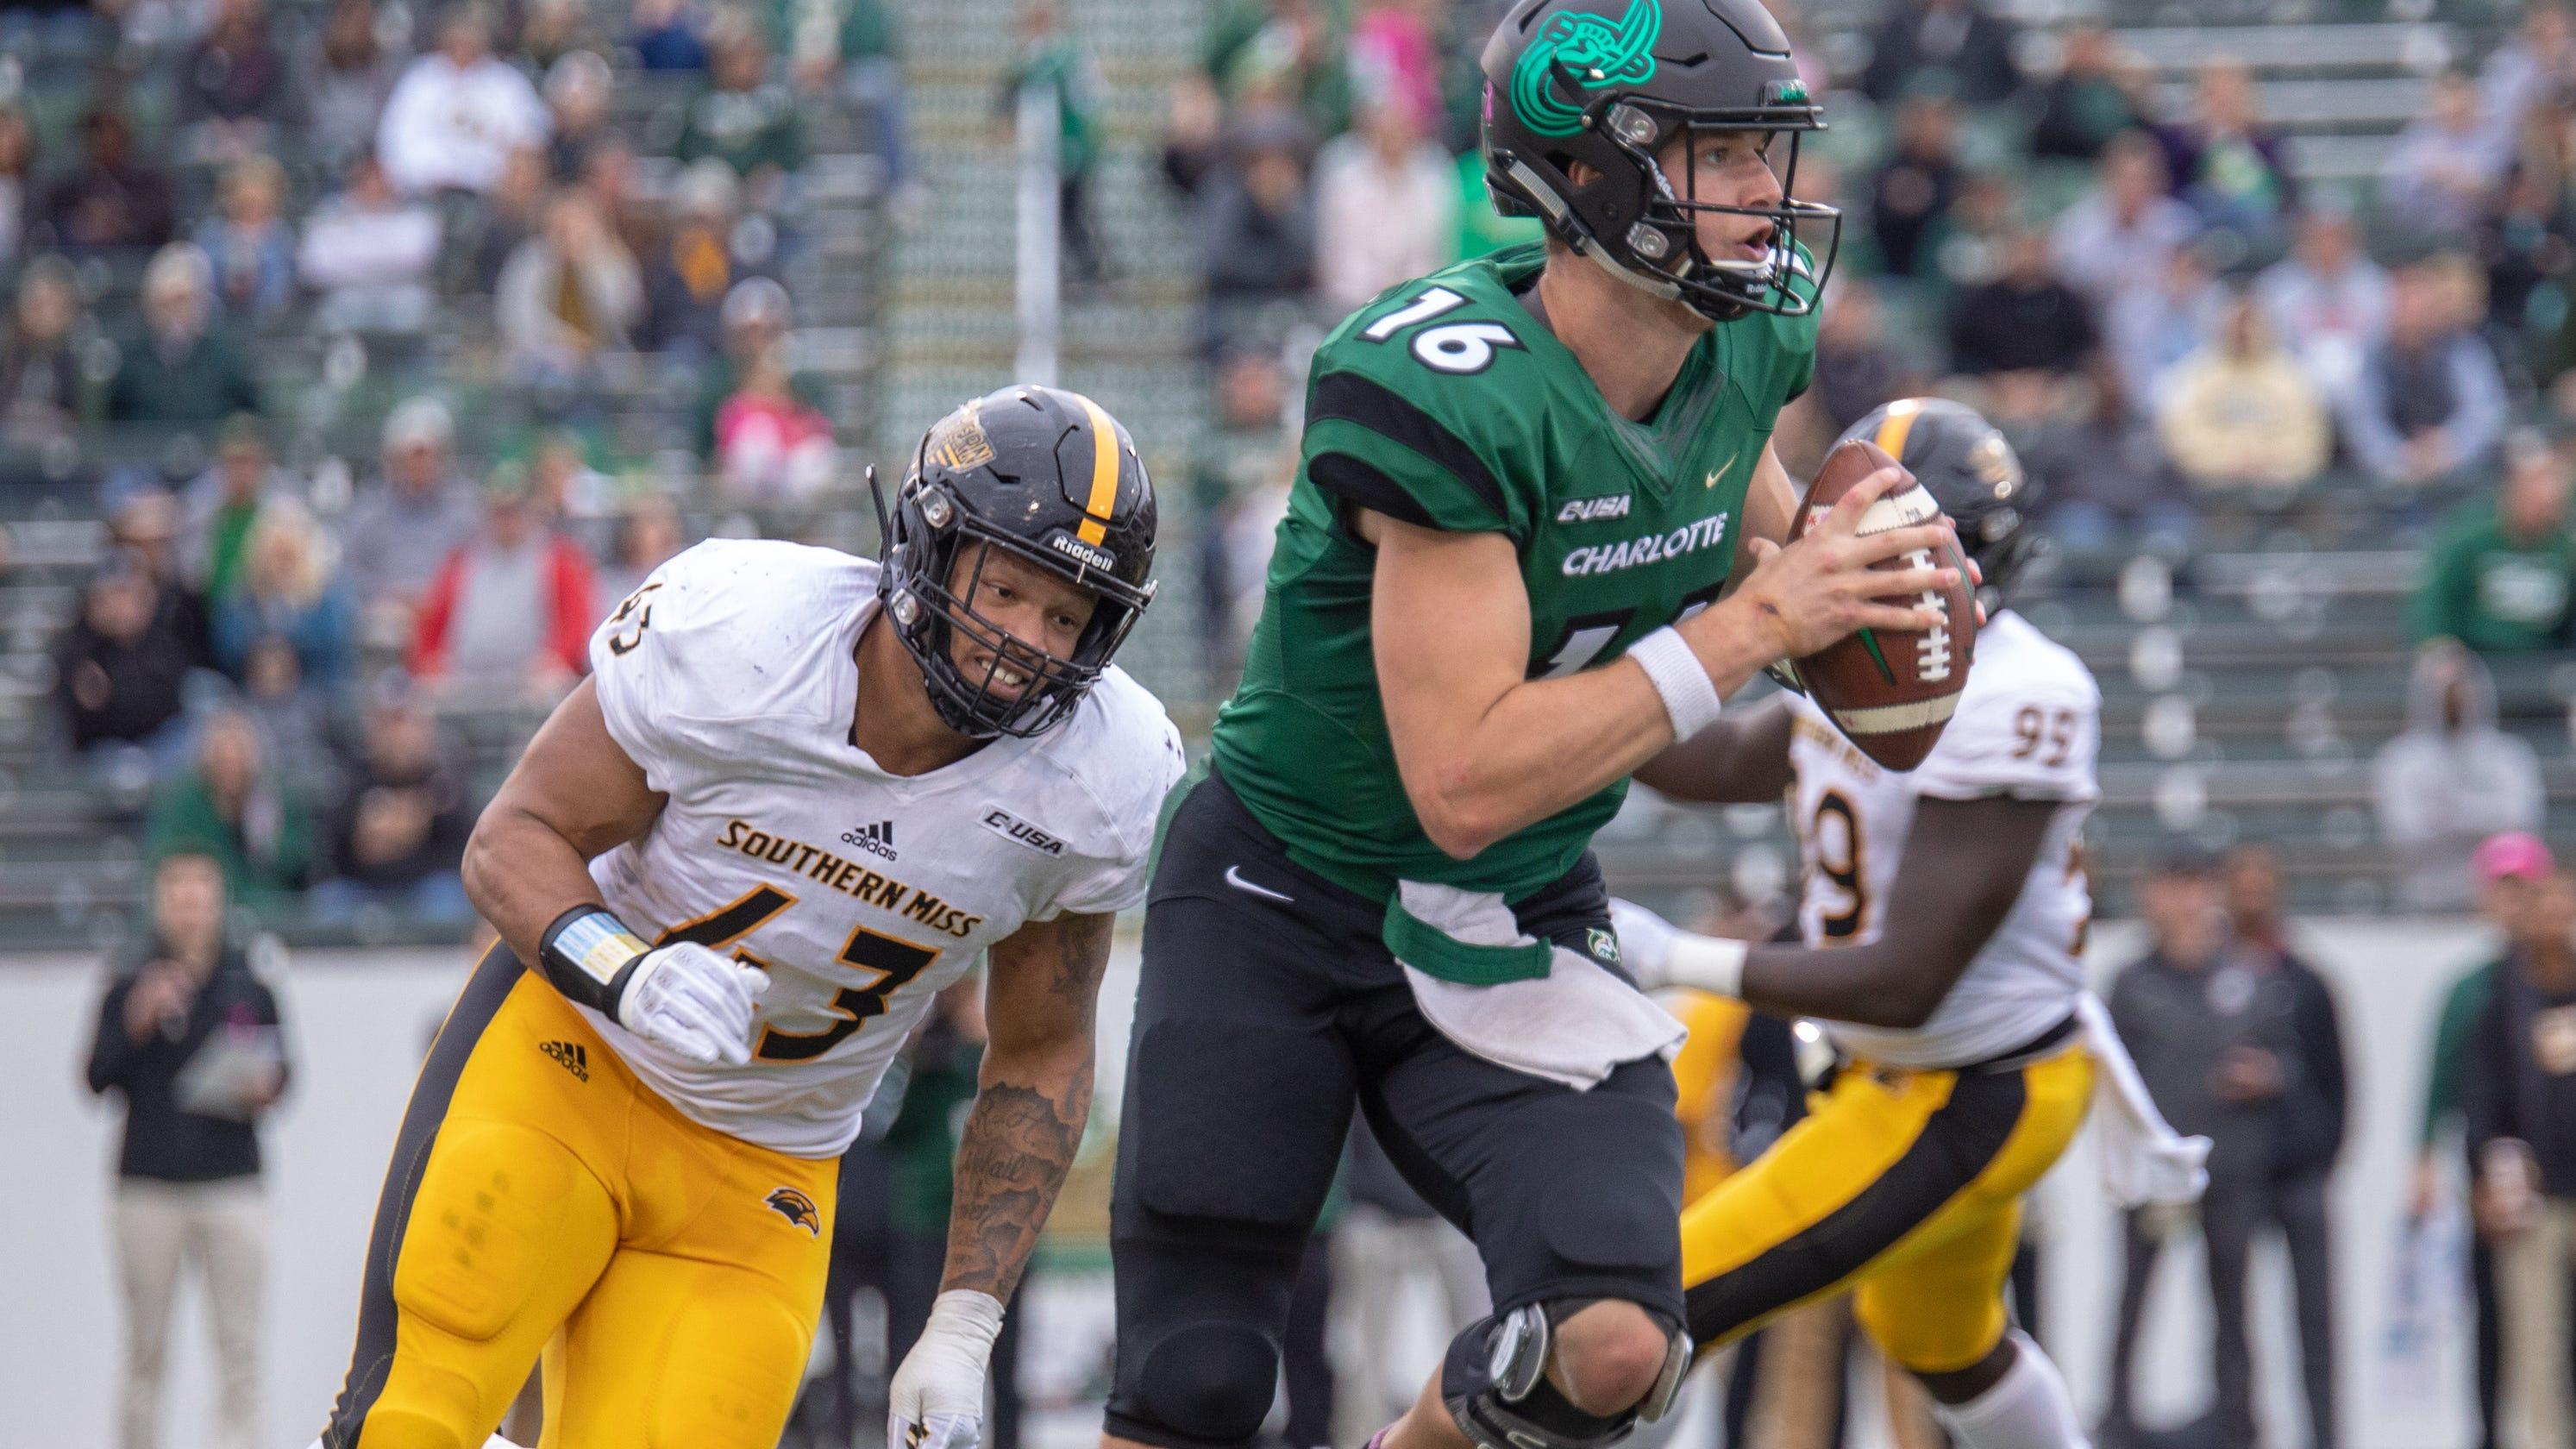 UT Vols: Tennessee football will play Charlotte next